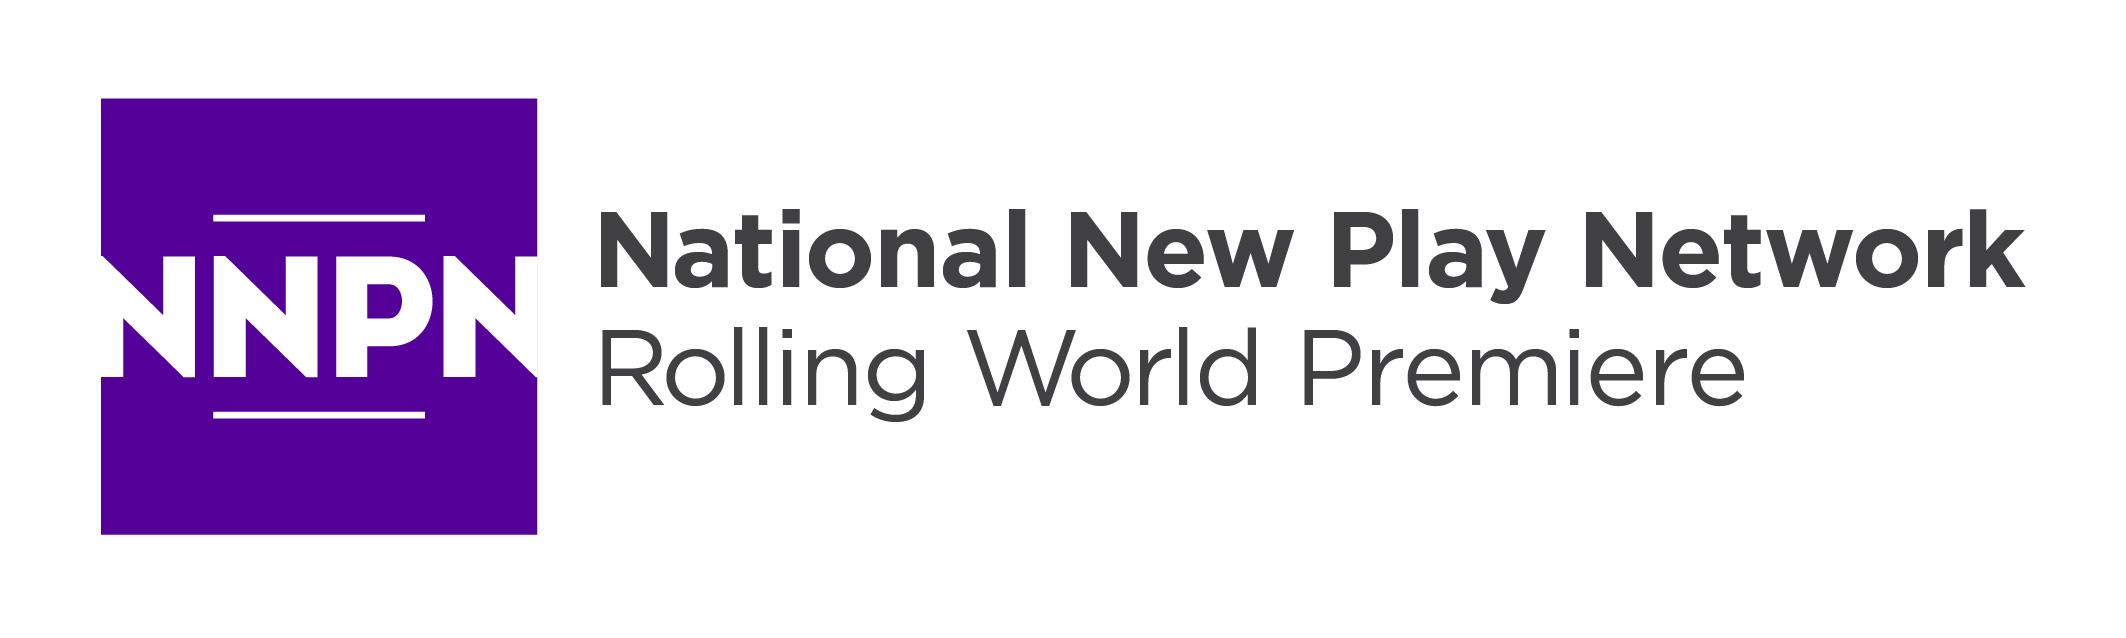 NNPN_RWP-full-WEB.jpg